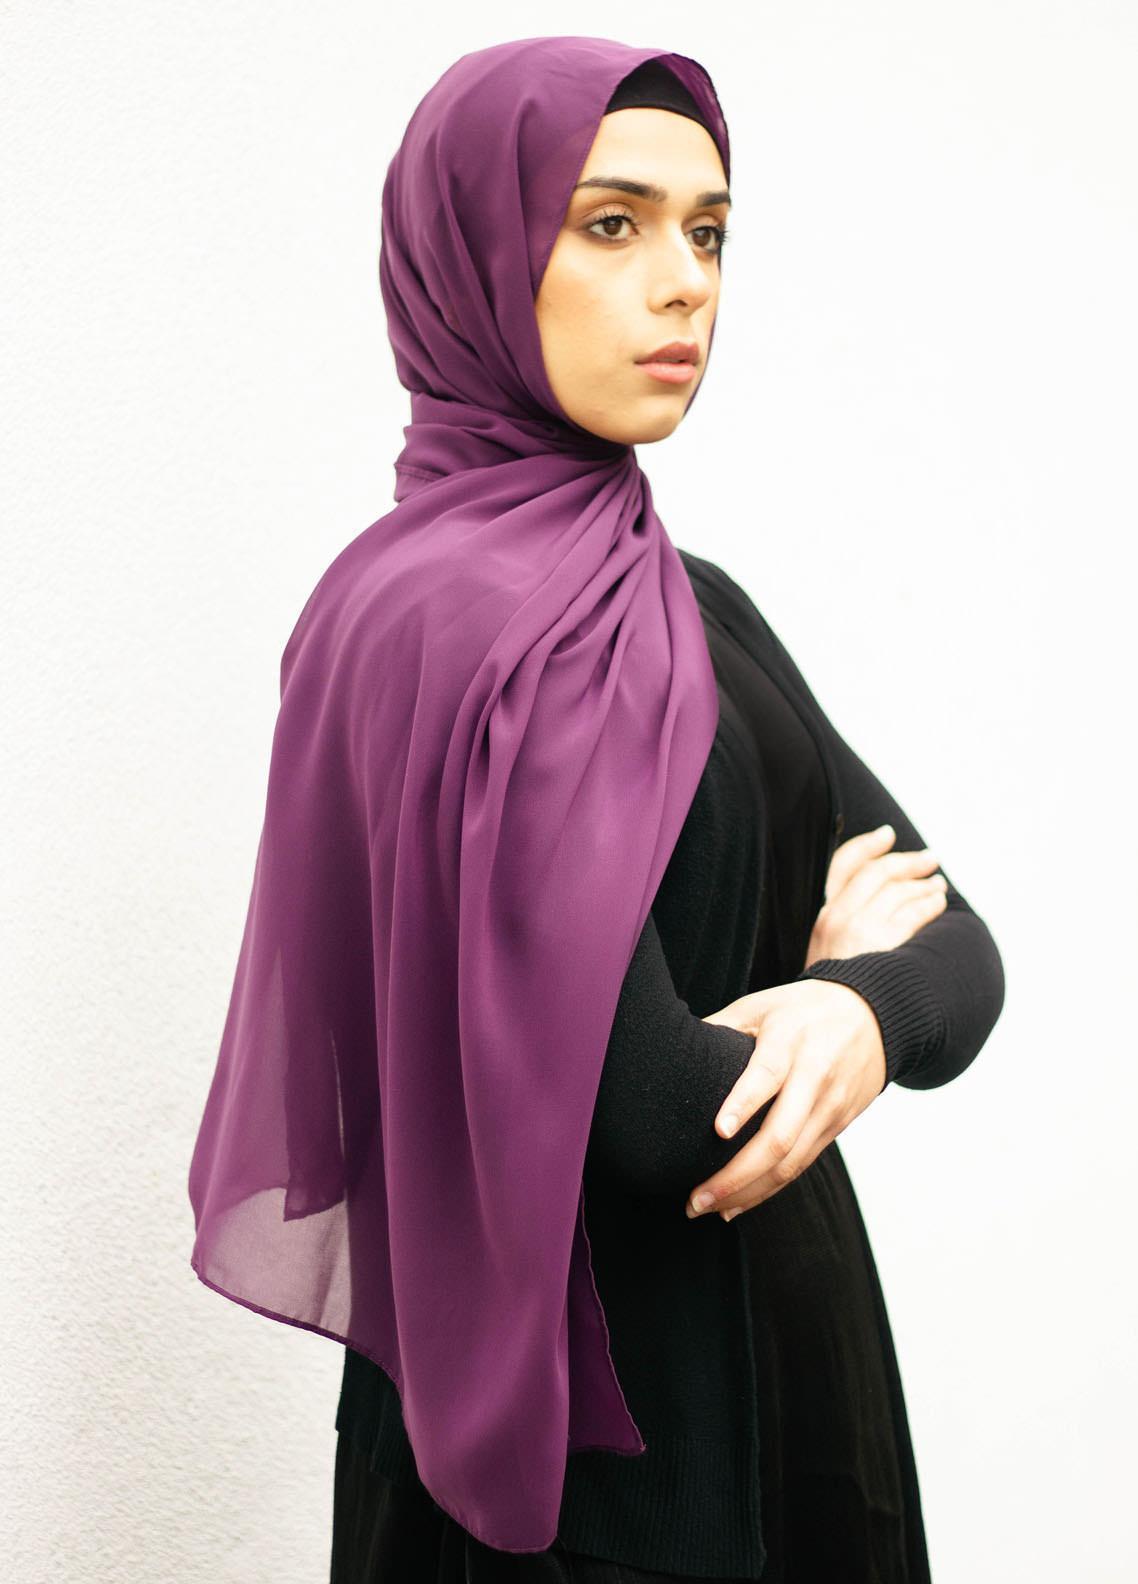 Nida Gul Printed Chiffon Hijab NG20MDH H-101 Luxury Butter Chiffon Hijab Amethyst